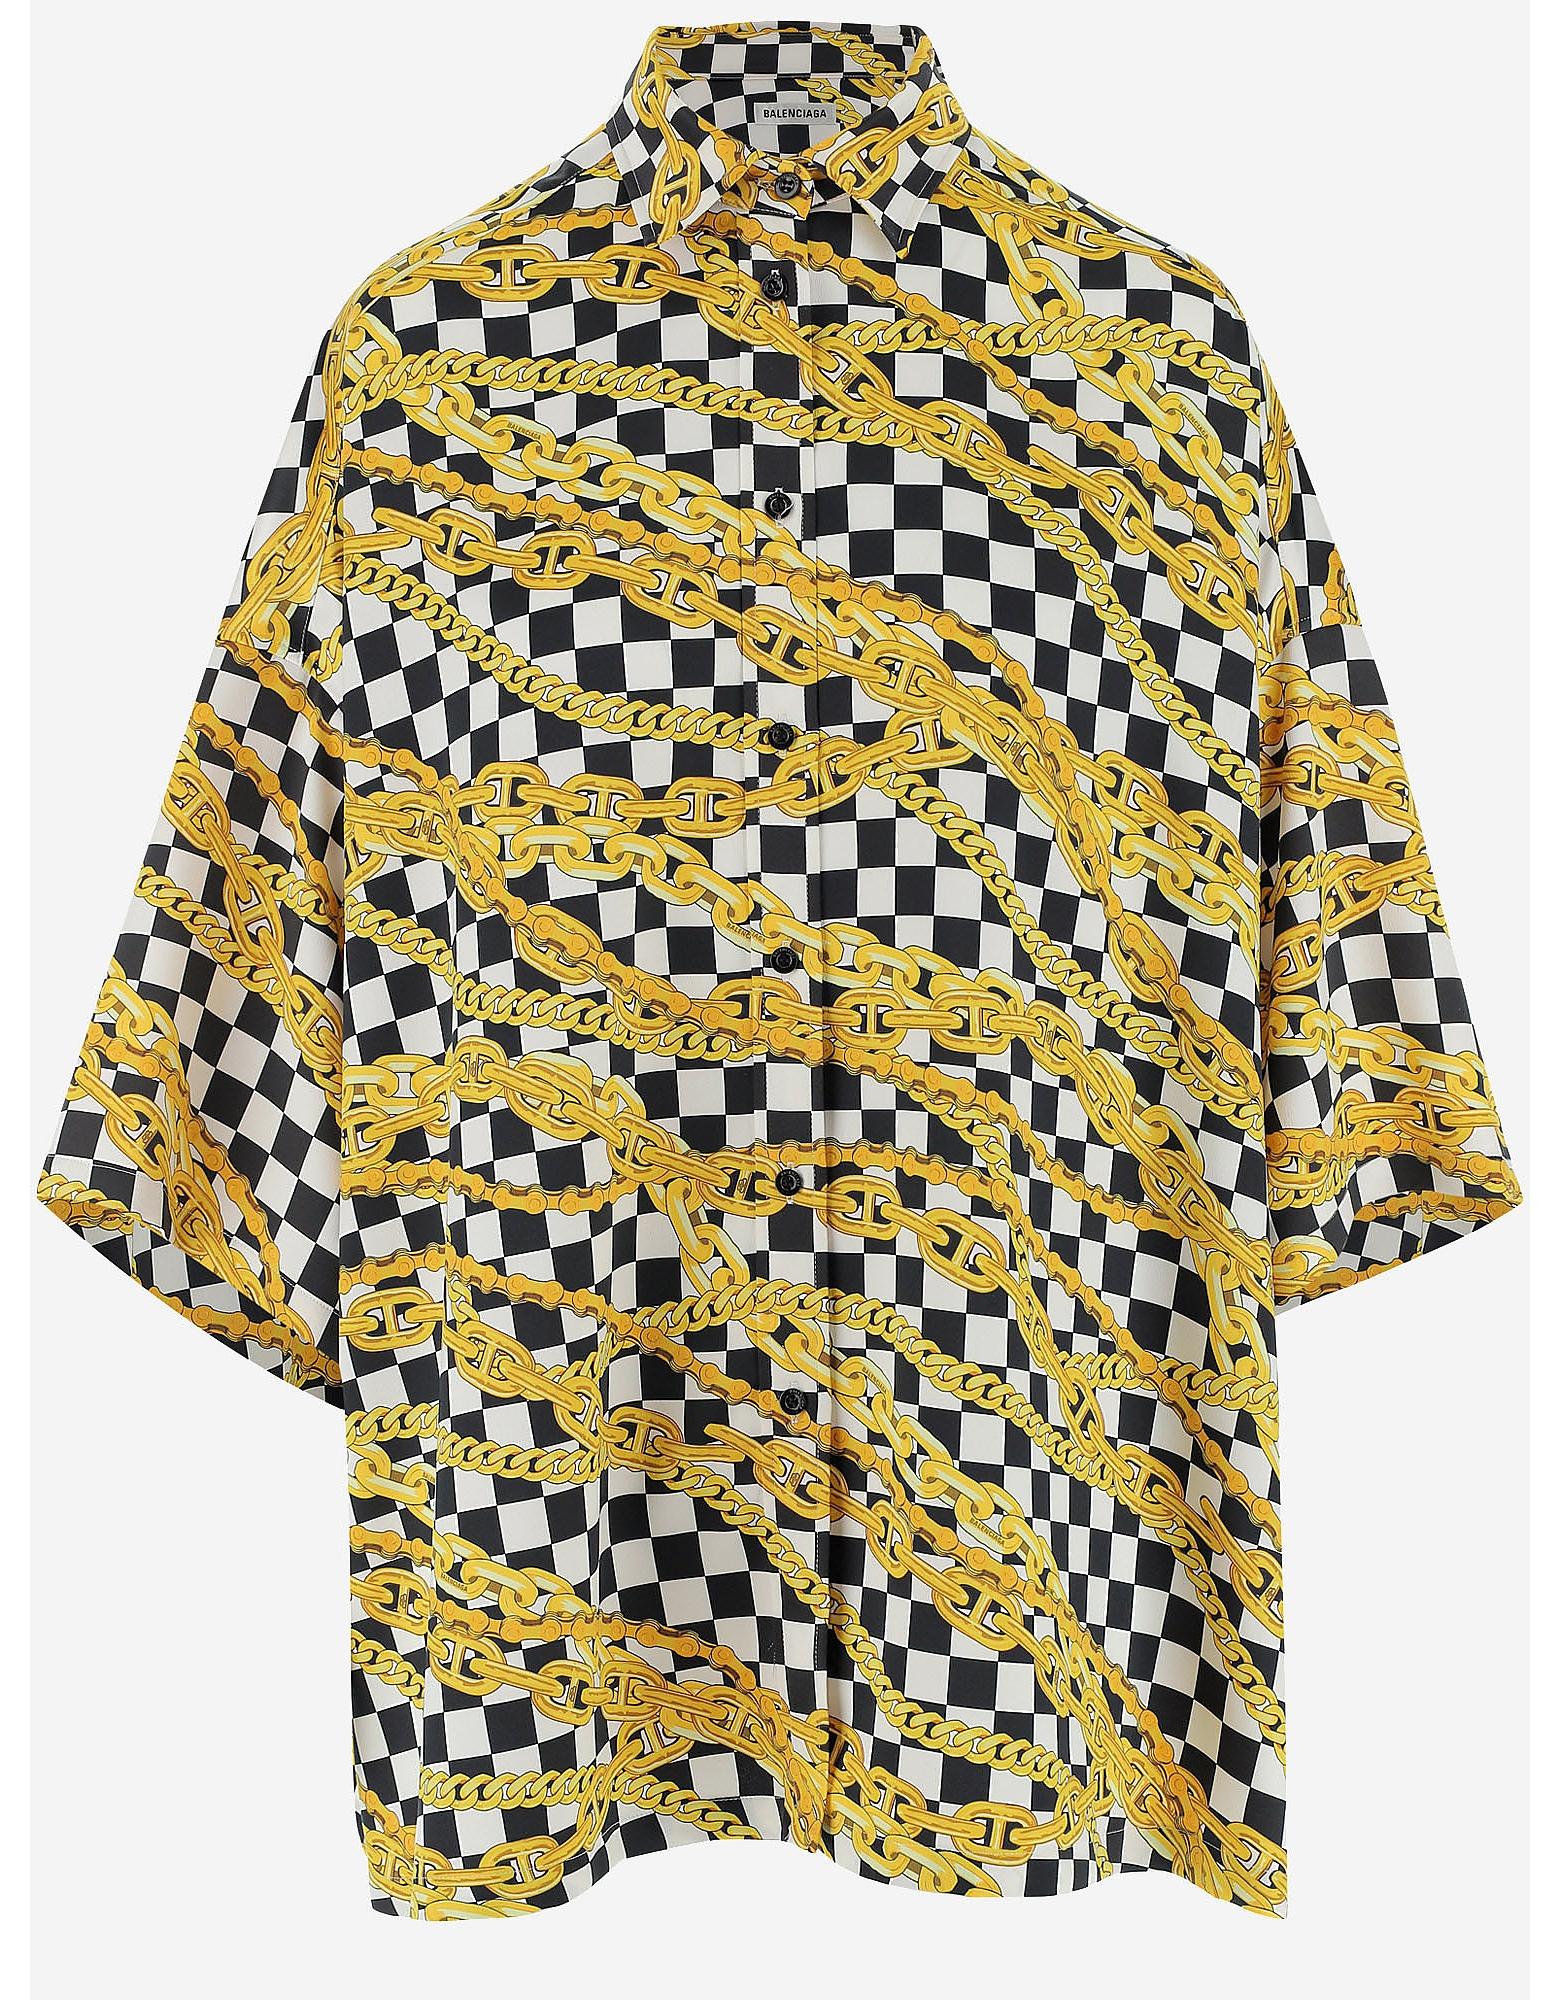 Balenciaga Designer Shirts, Balck and White Satin Women's Shirt w/Chain Print